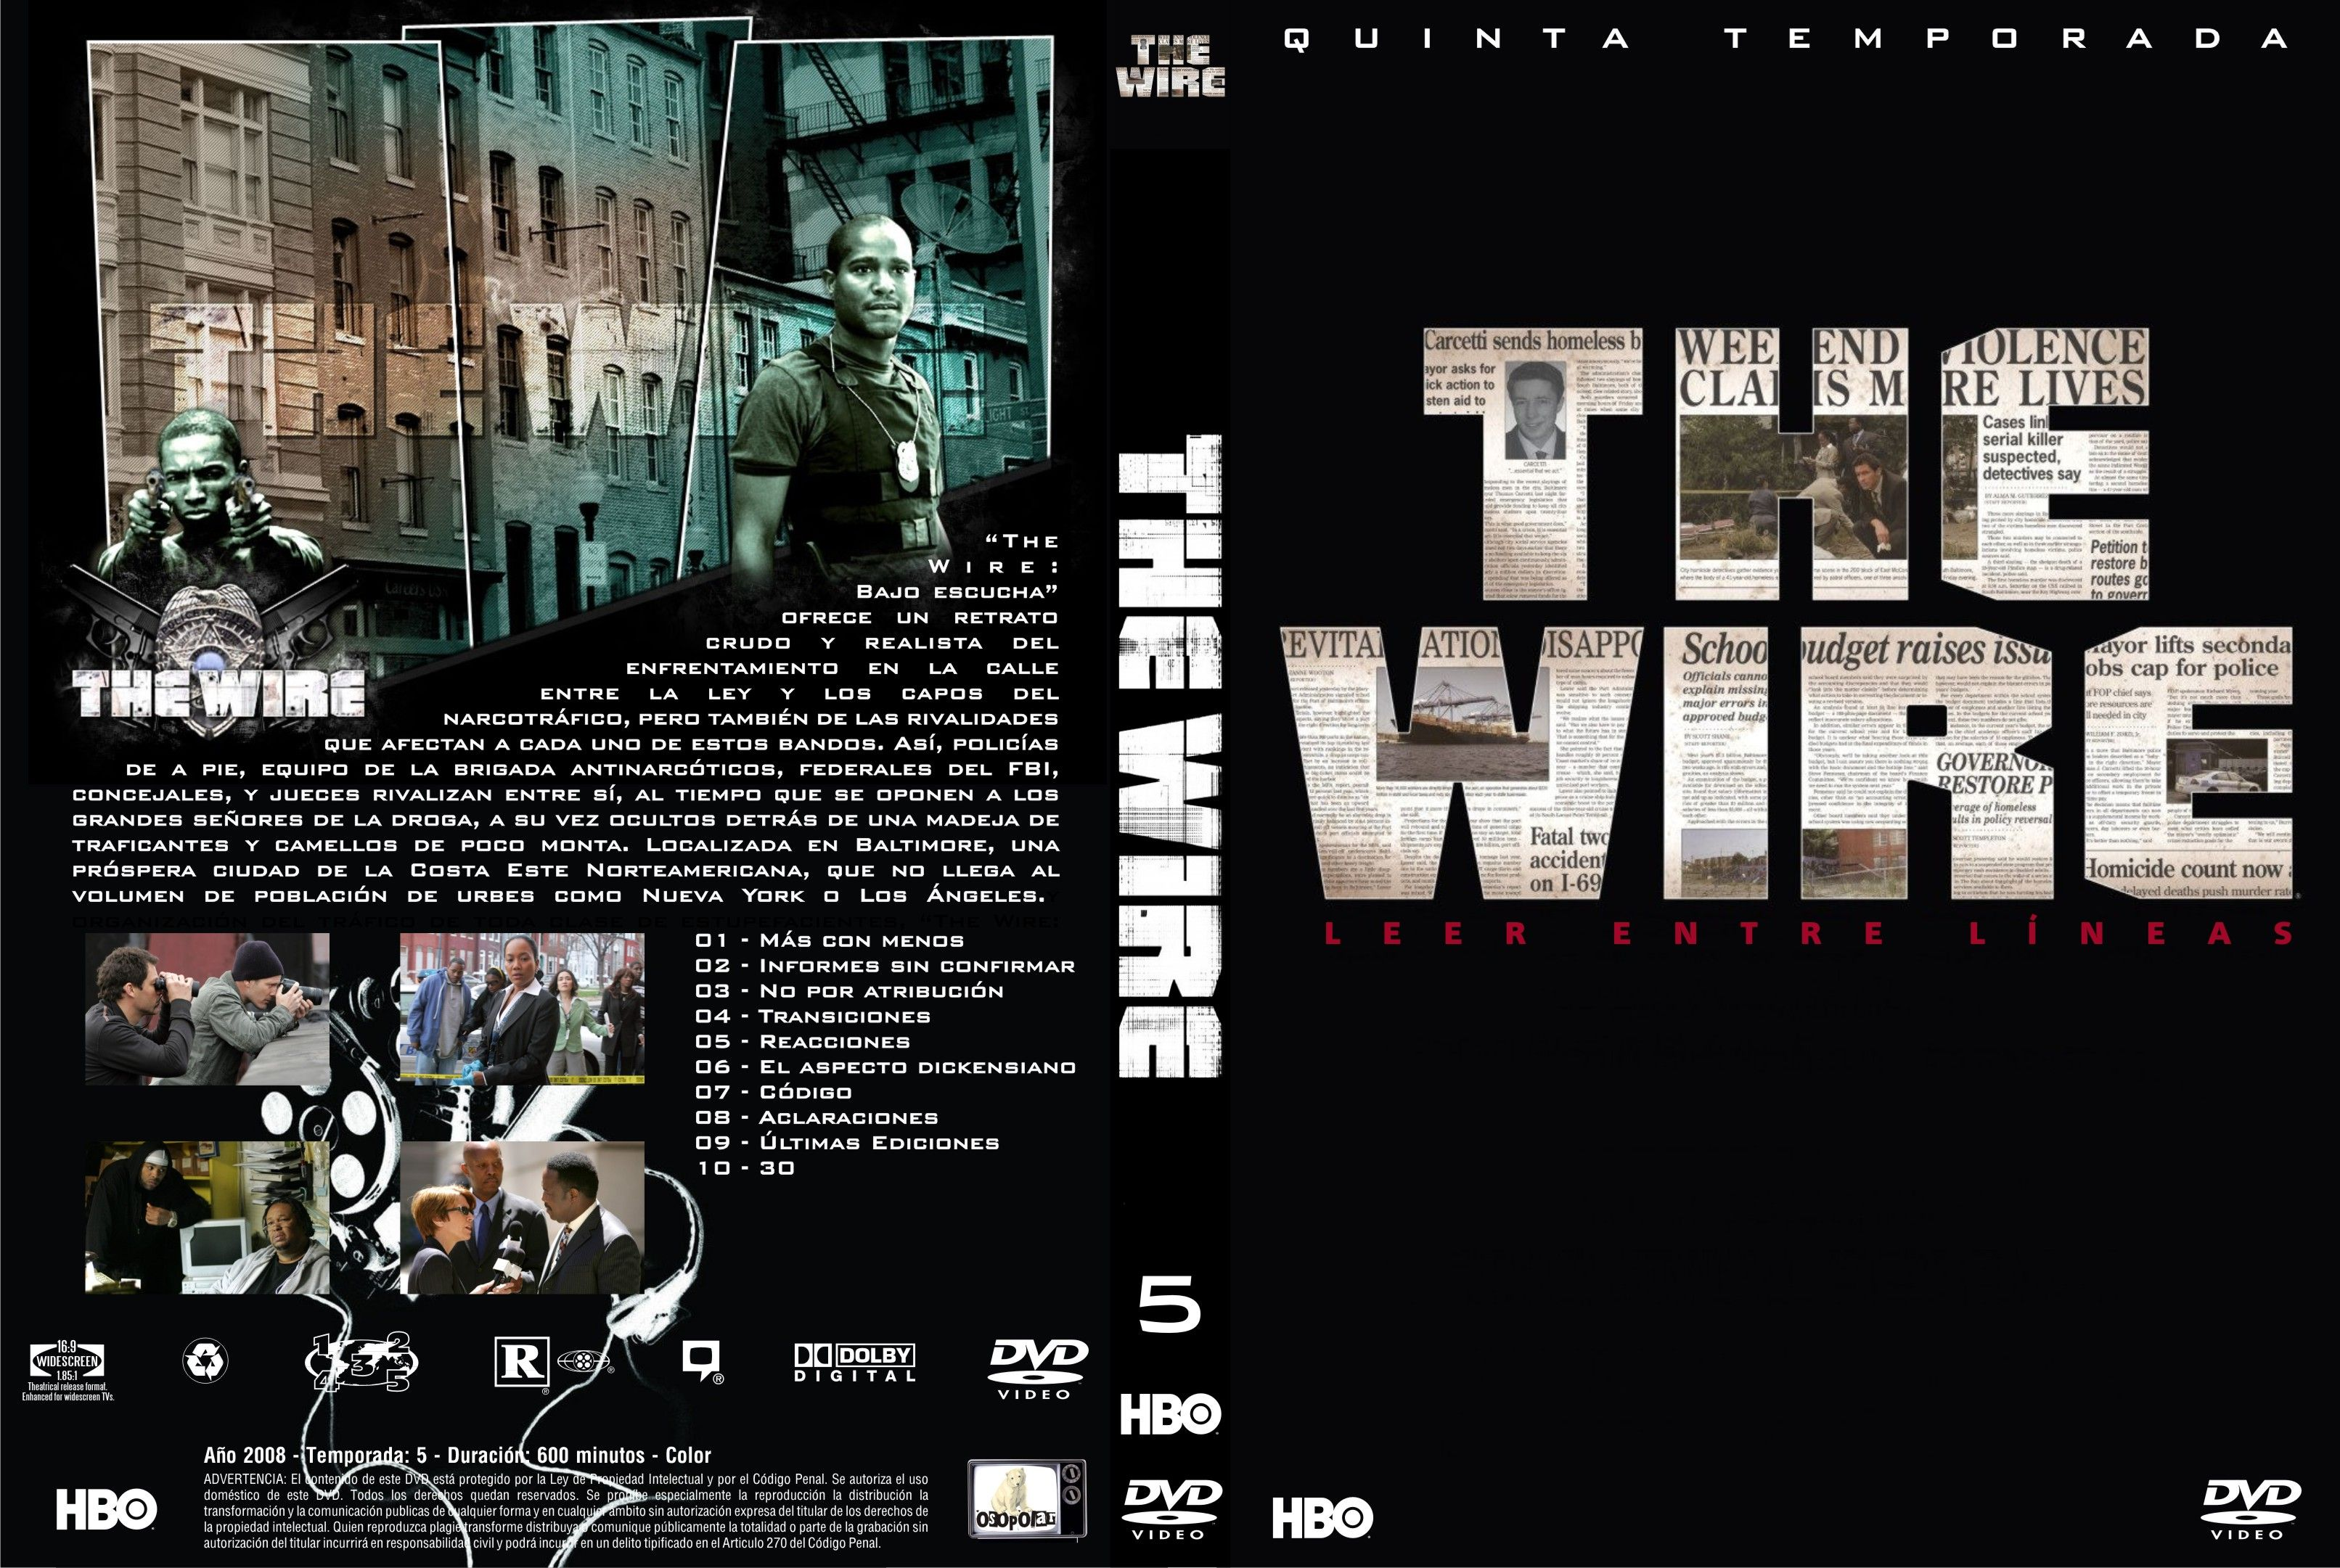 The wire season 5 episode 3 imdb / Australian press release sites